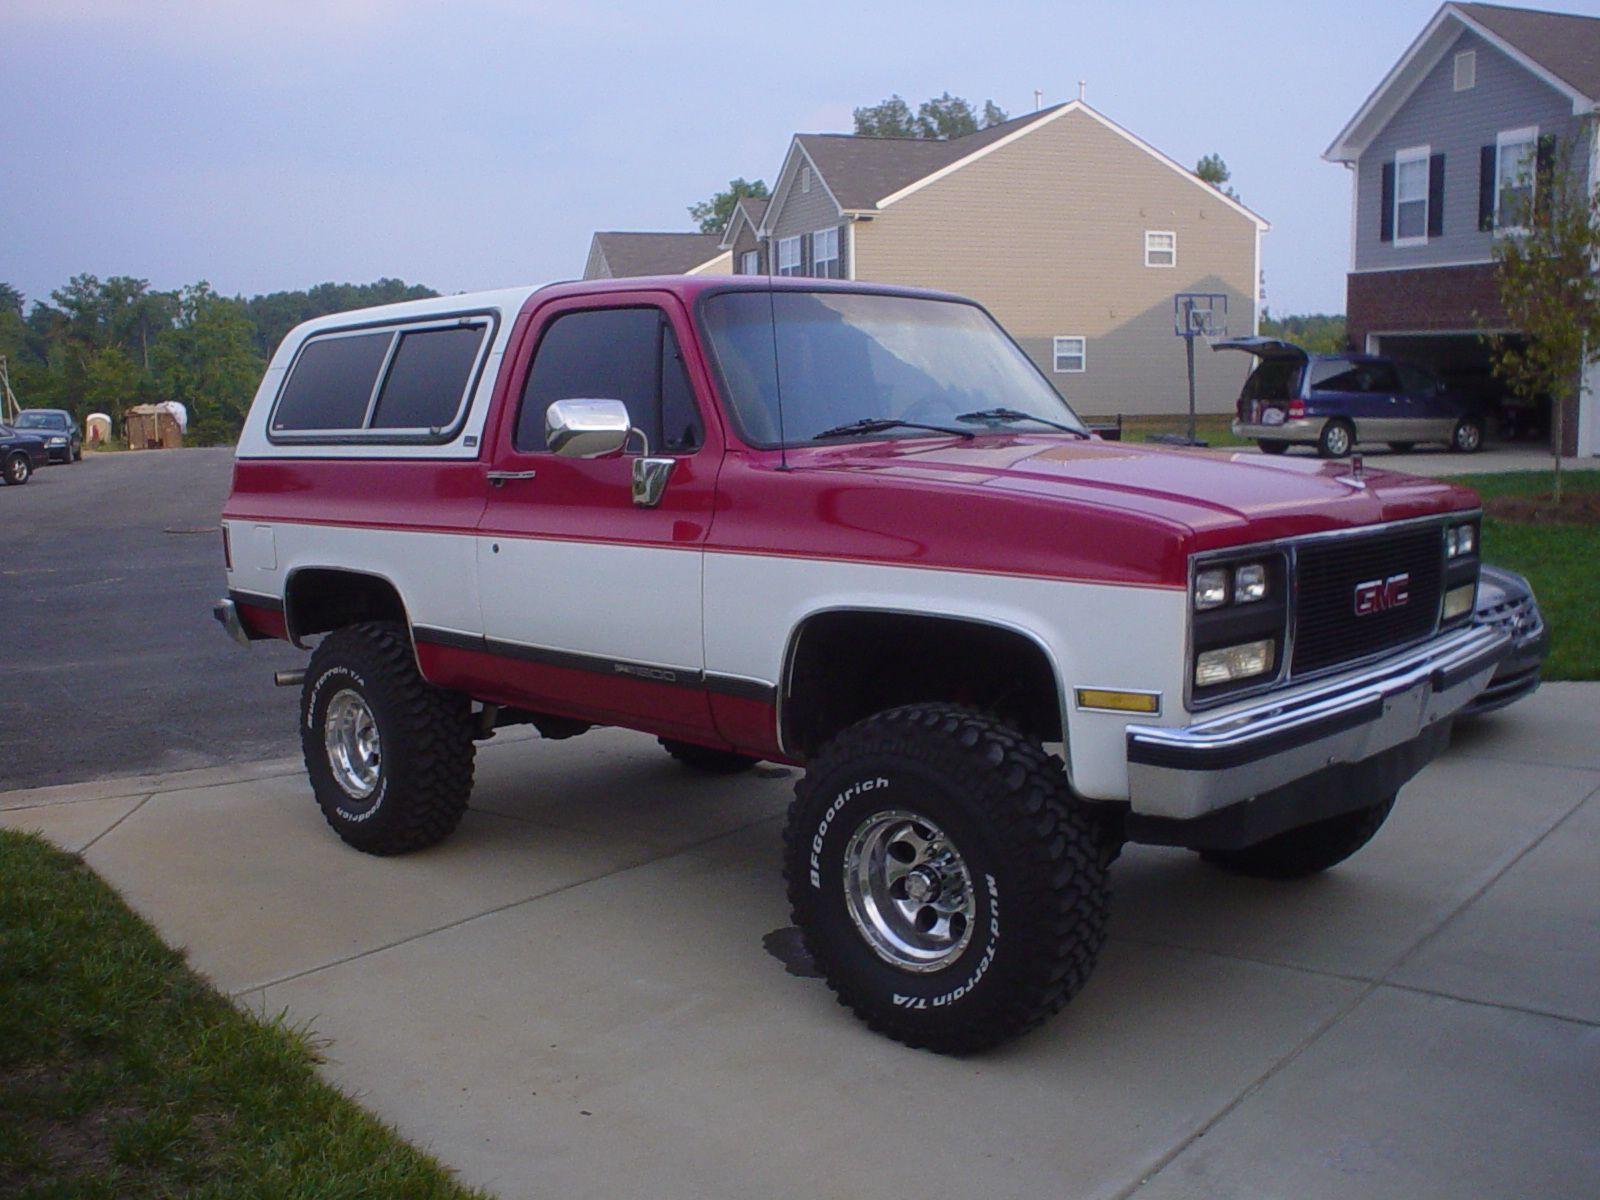 1989 Gmc Jimmy Pic 49650 Jpeg 1 600 1 200 Pixels Gmc Chevrolet